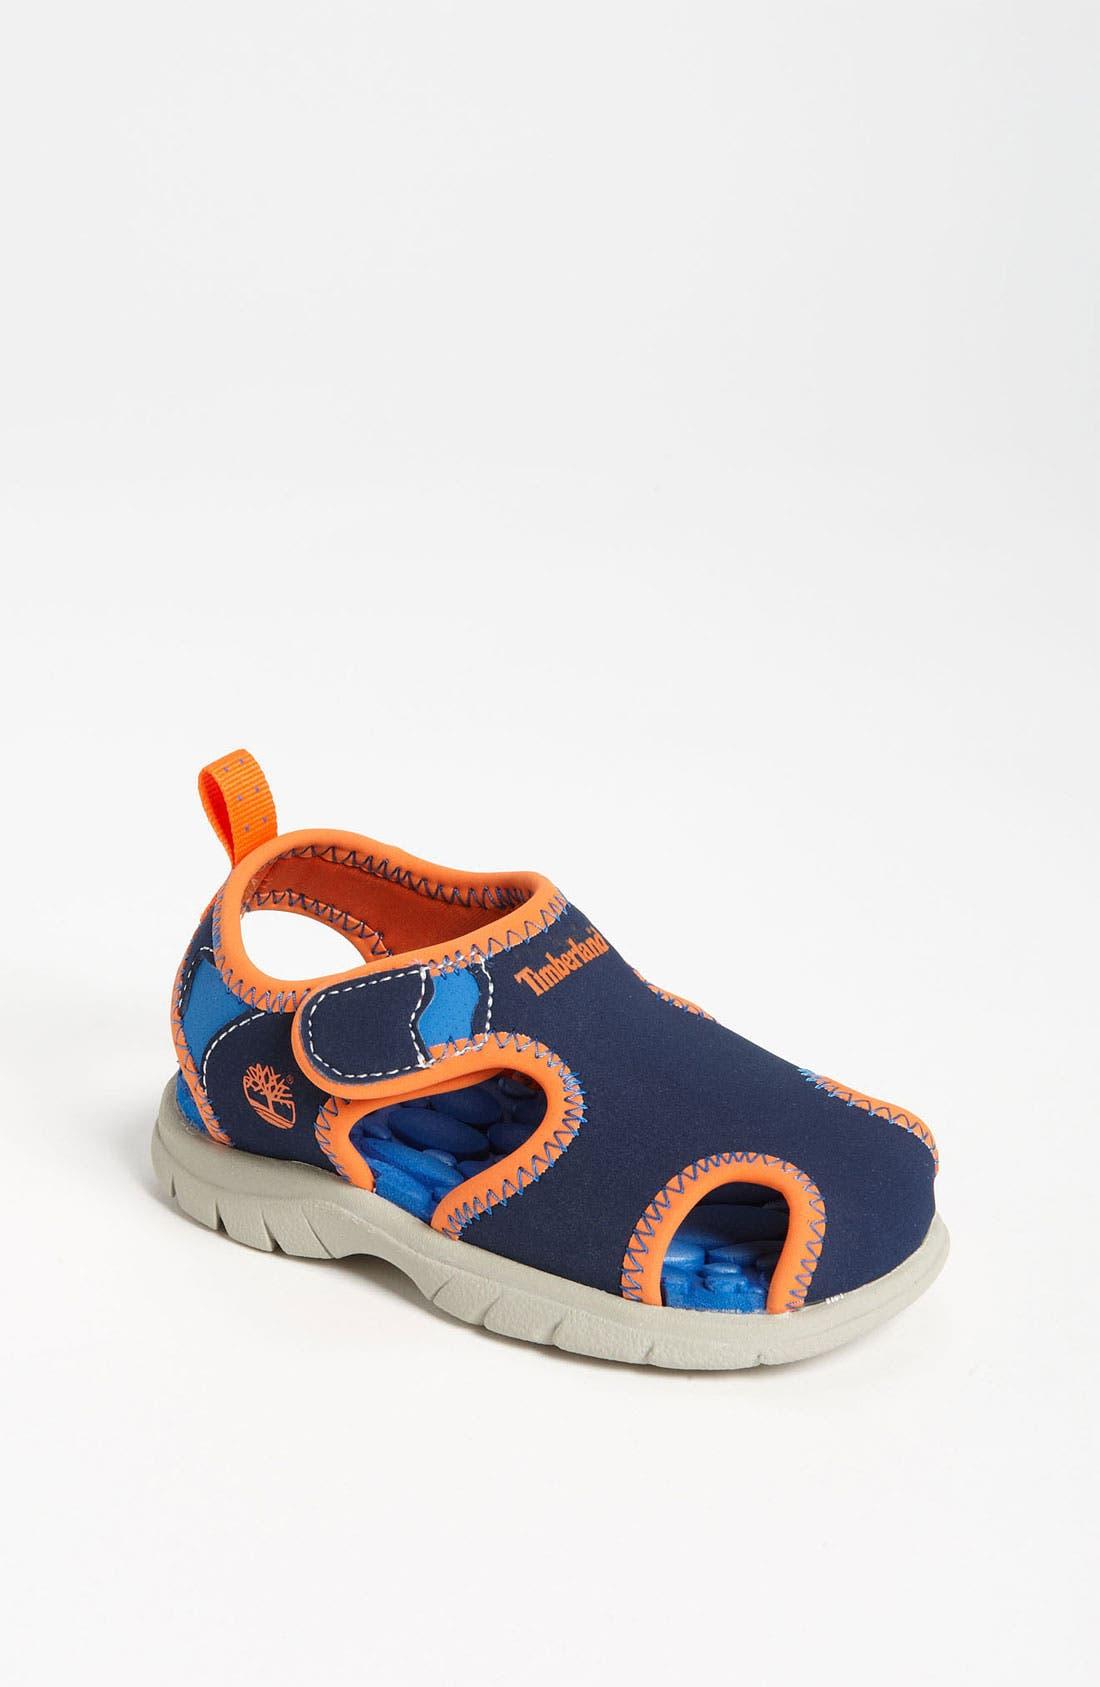 'Little Harbor' Sandal,                             Main thumbnail 1, color,                             Navy/ Orange